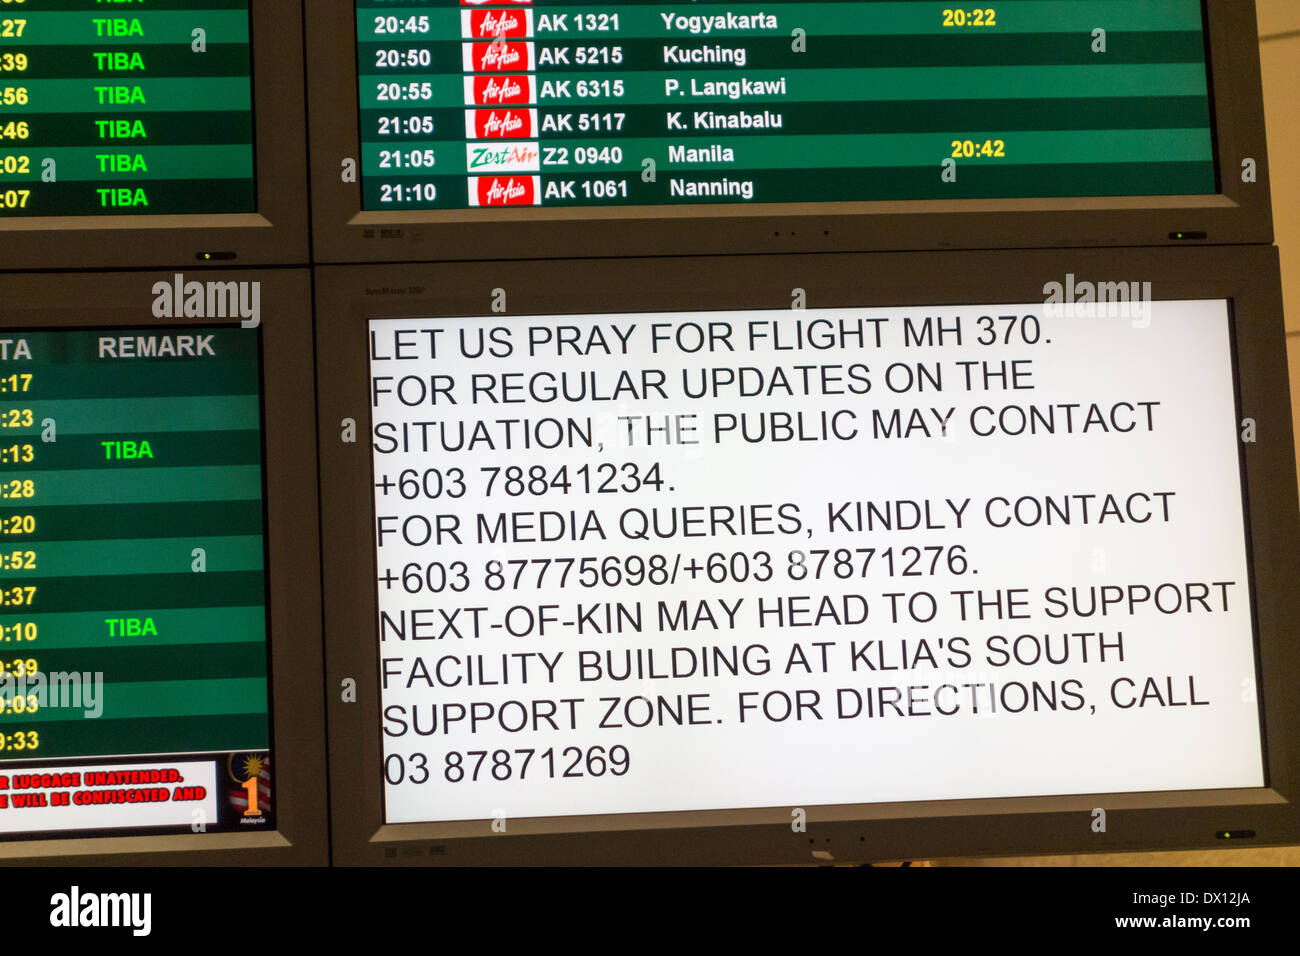 KLIA Kuala Lumpur International Airport Monitor Bildschirm Nachricht fehlt Malaysia Airlines Flug MH370 Samstag, 8. März 2014 Stockbild